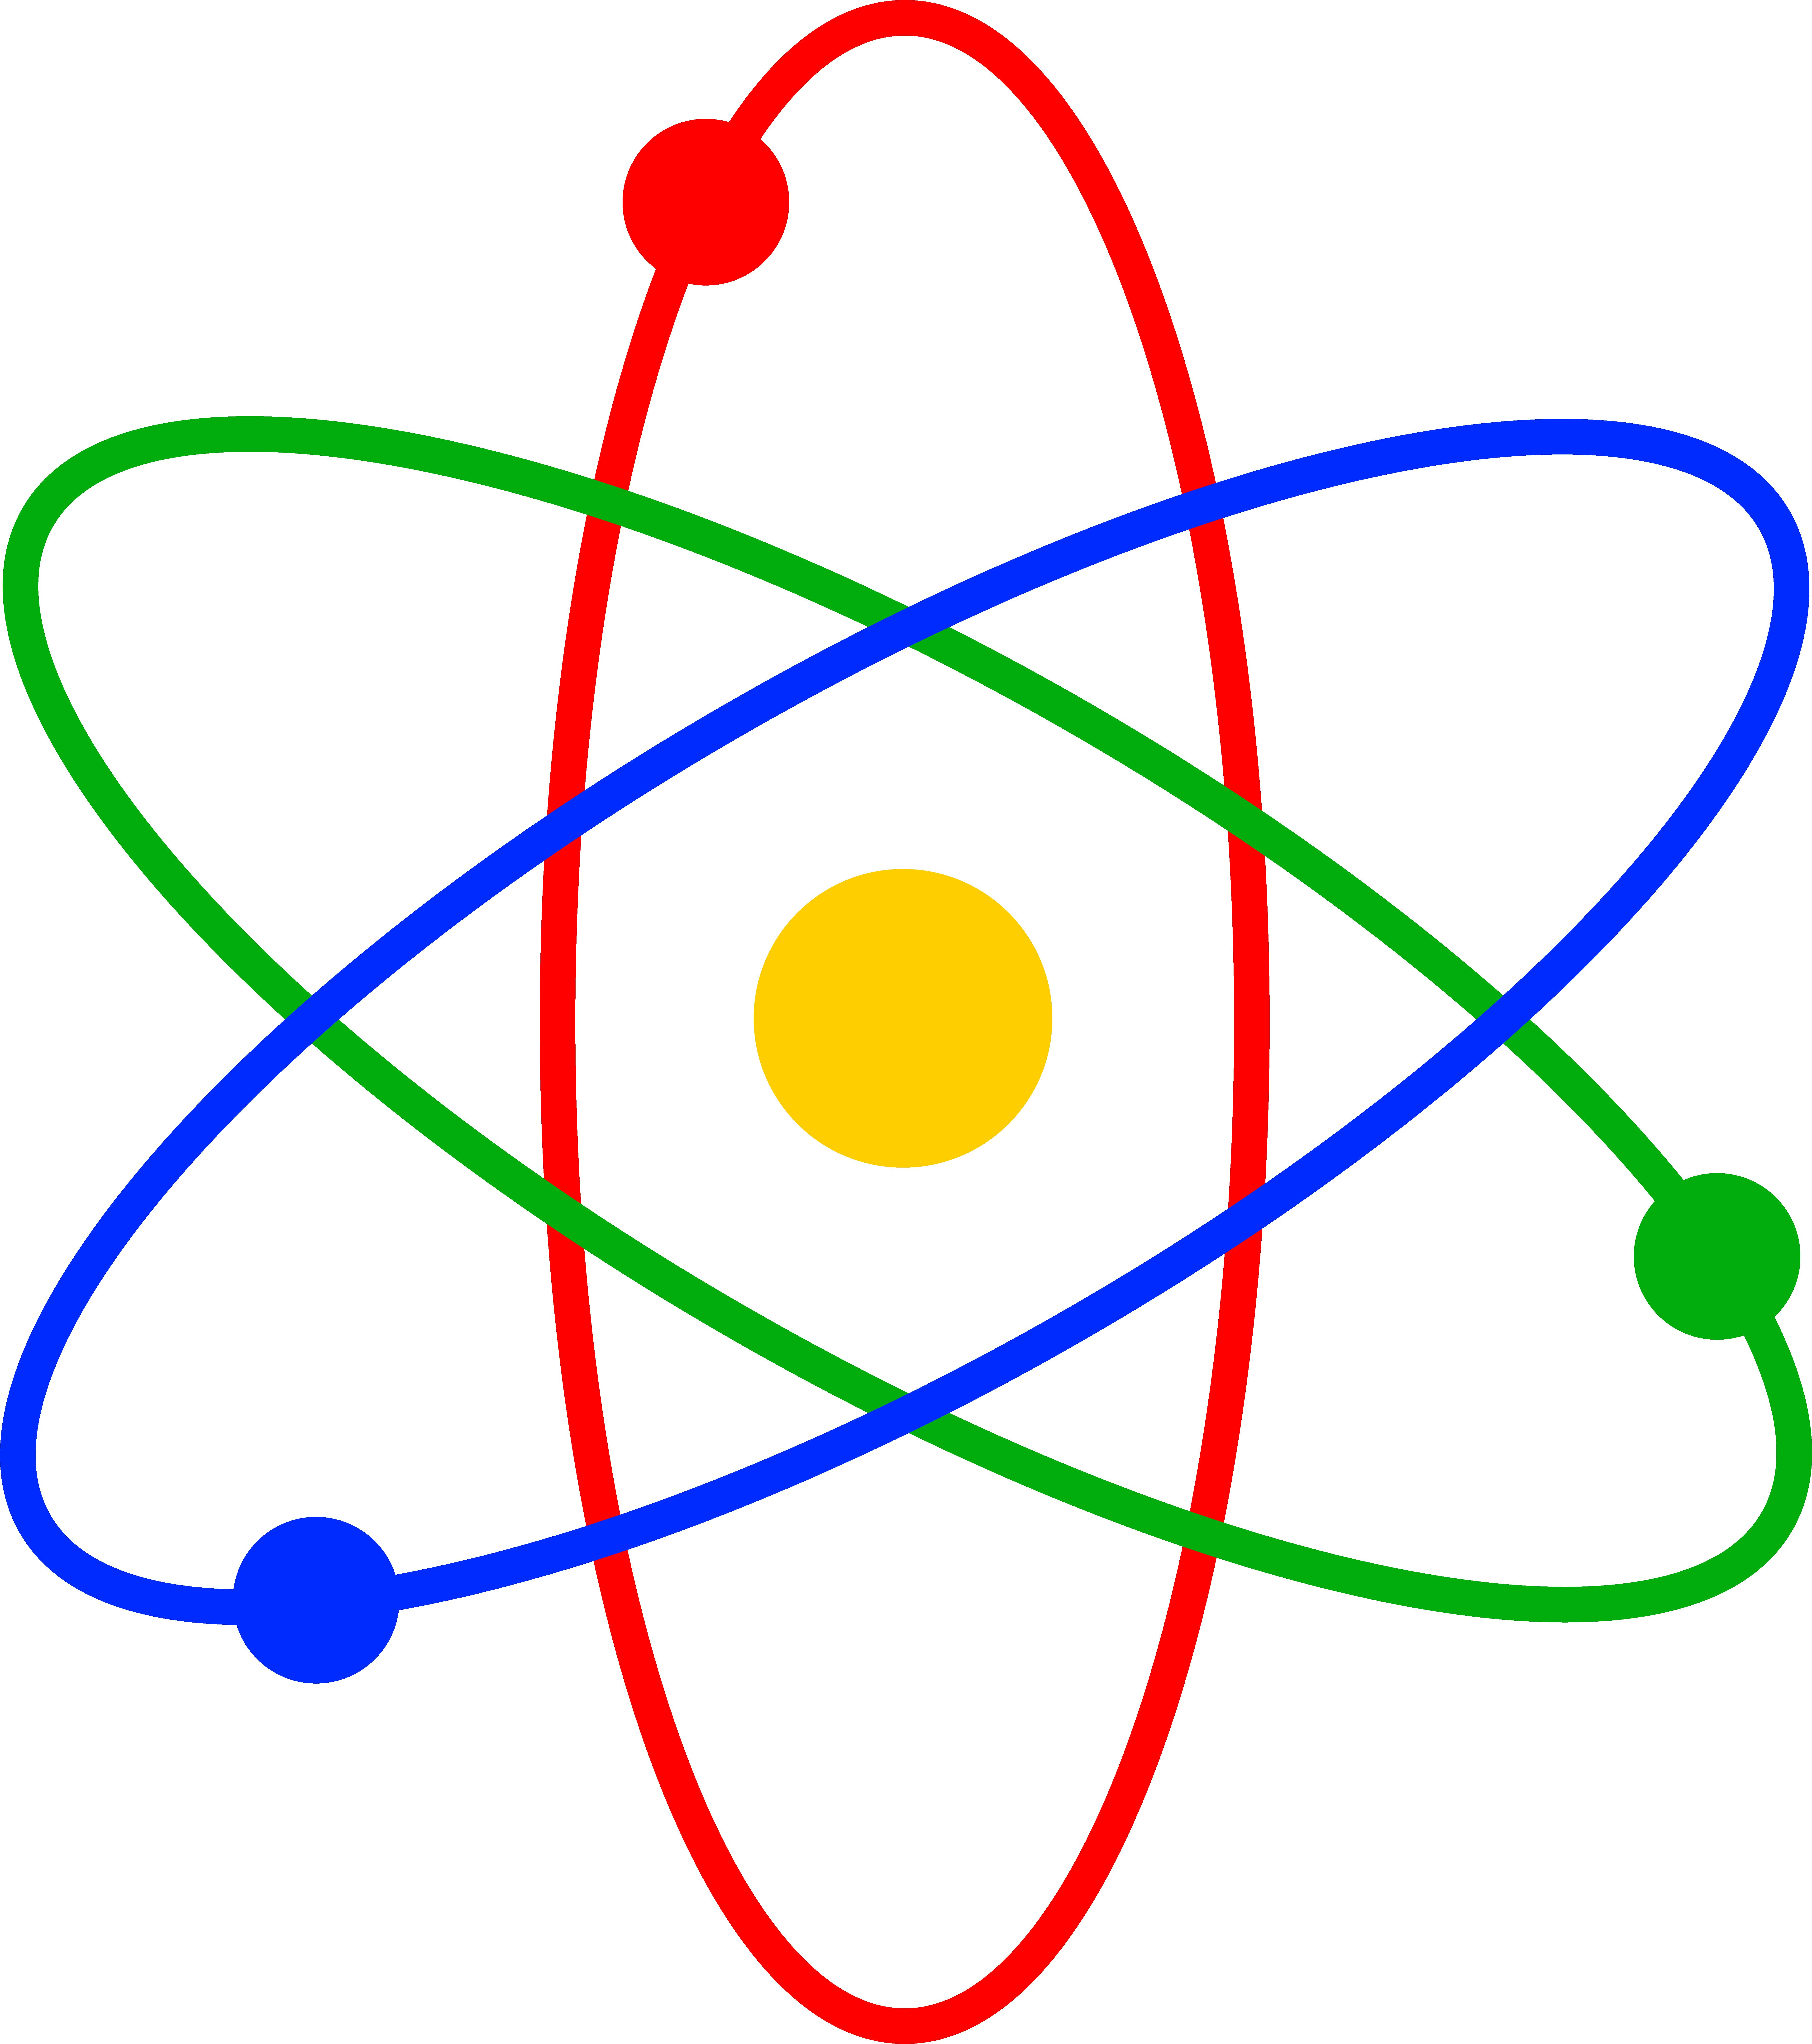 7628x8604 Colorful Atom Symbol